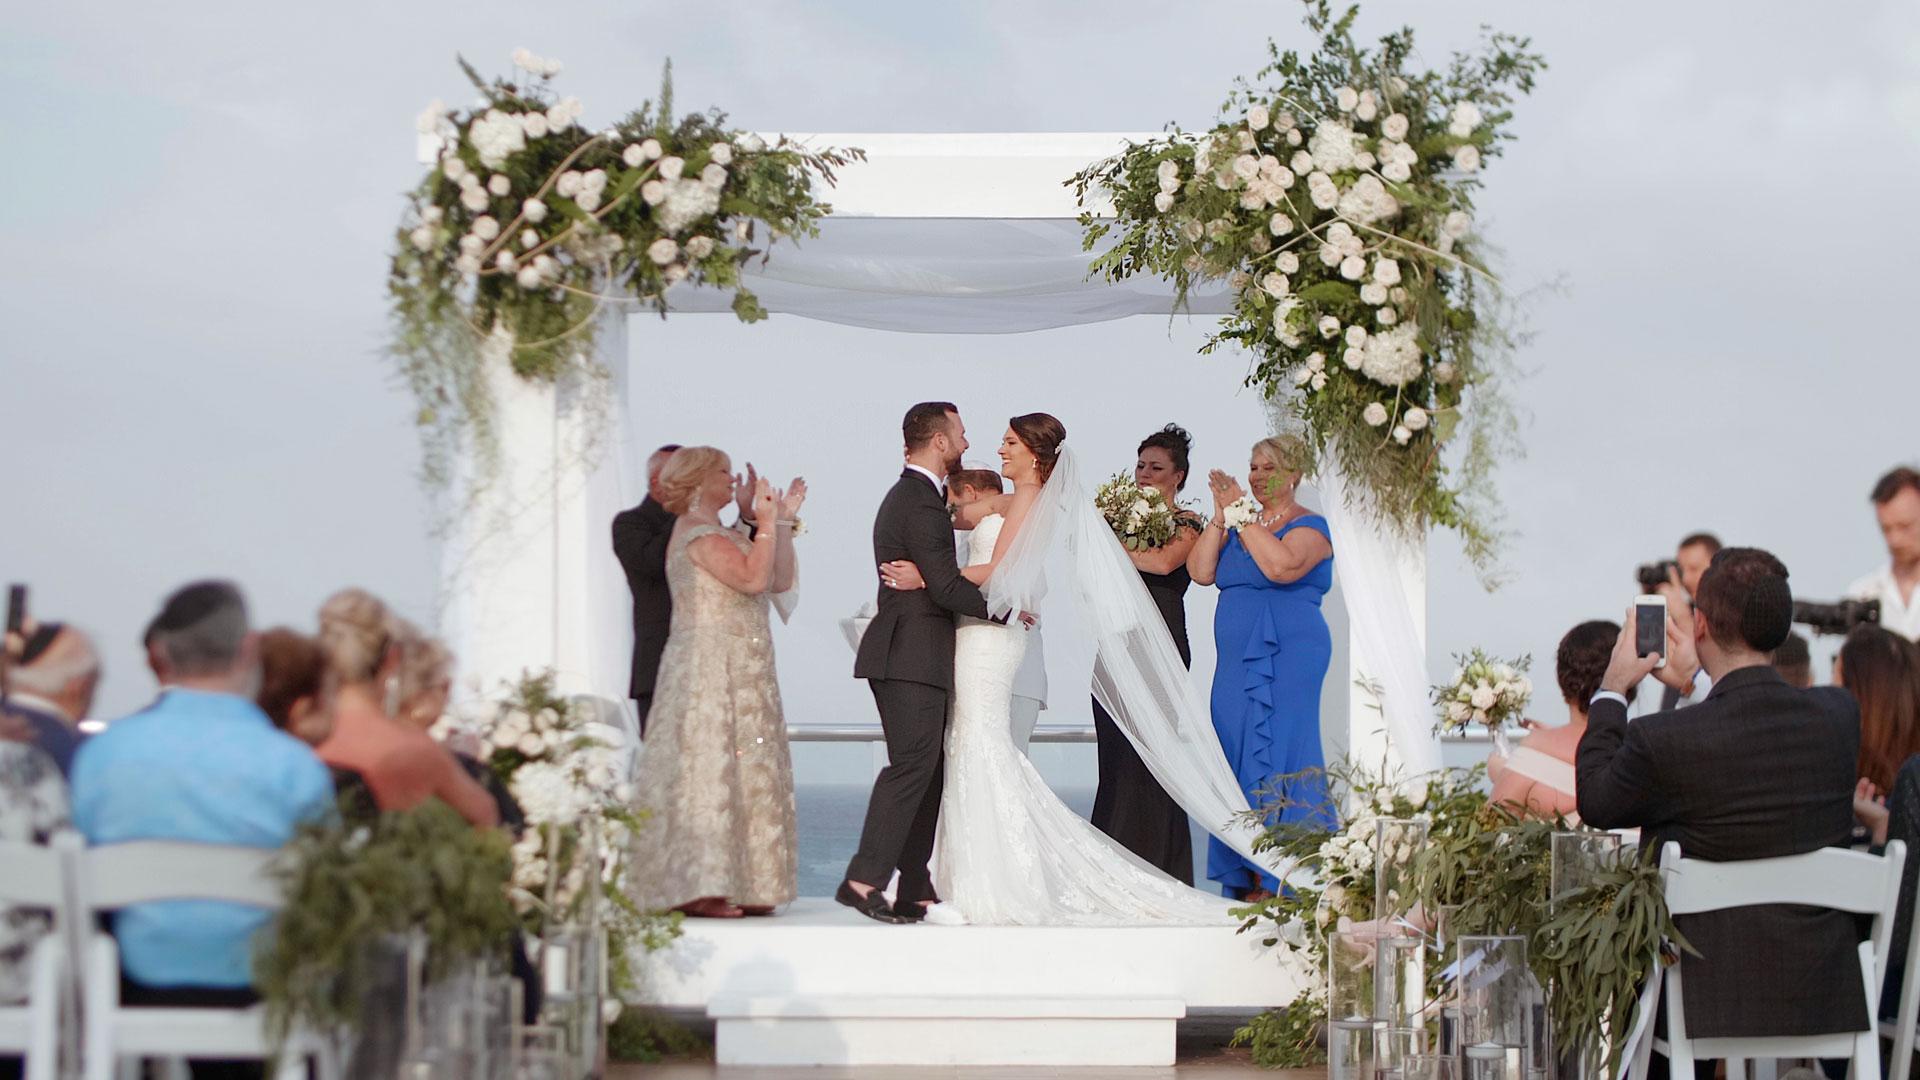 Jewish ceremony at Azul Fives, Playa-del-Carmen wedding videography by kismet creative